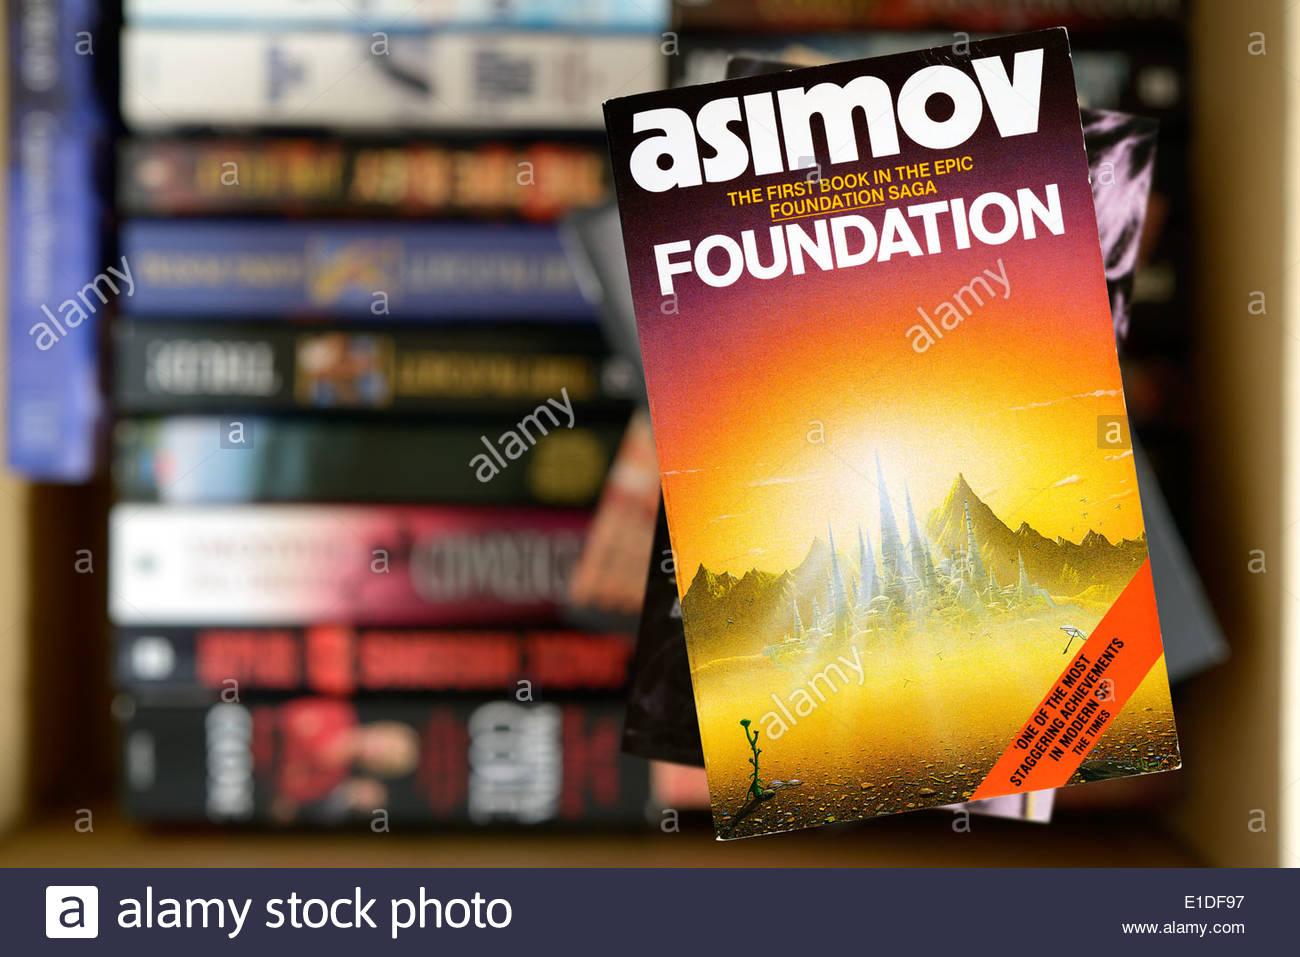 Isaac Asimov paperback title Foundation, stacked used books, England - Stock Image